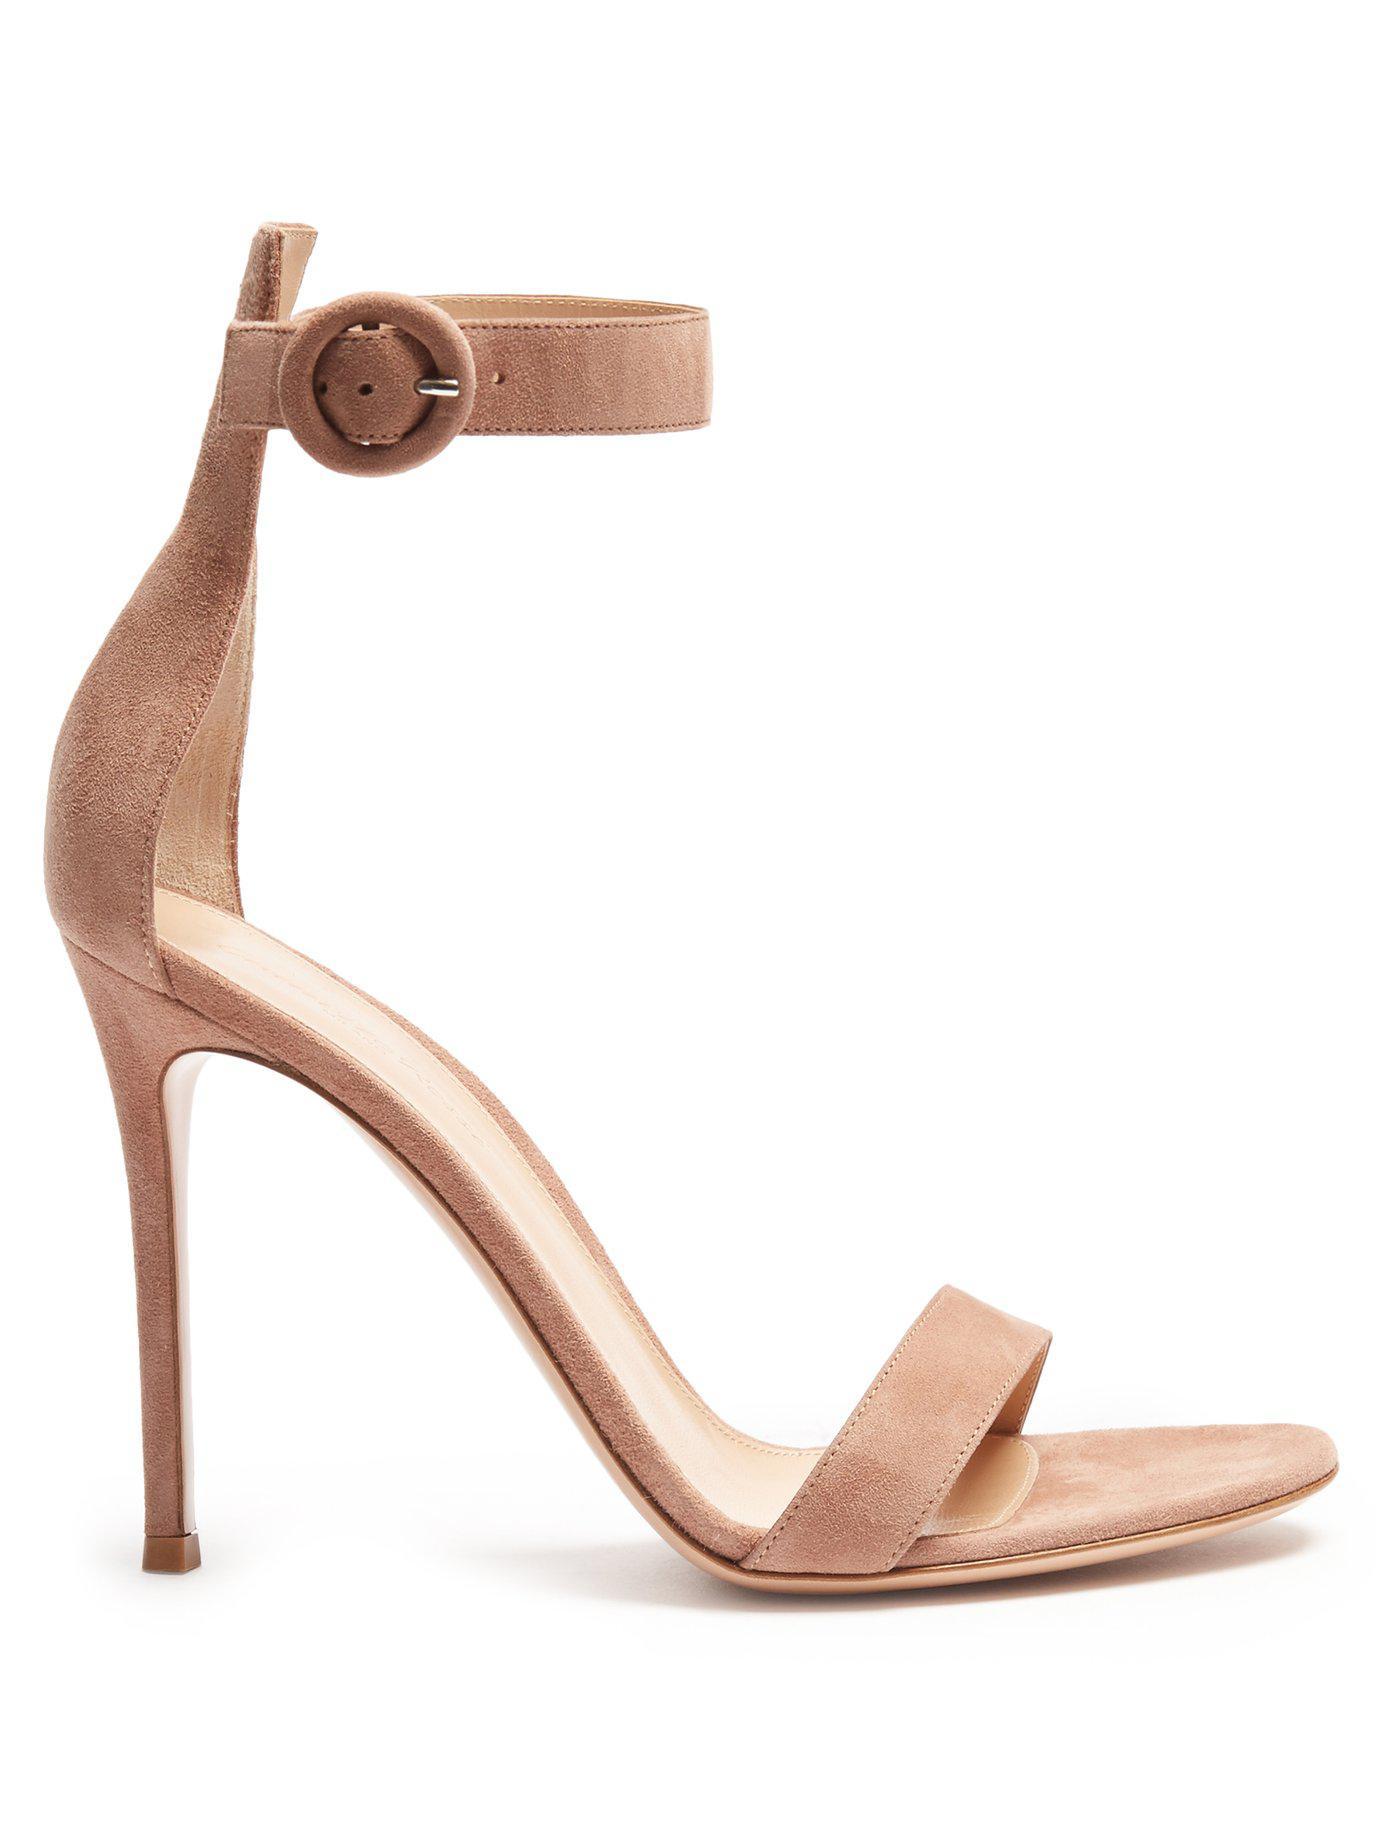 c83c04cb319 Gianvito Rossi. Women s Portofino 100 Suede Sandals